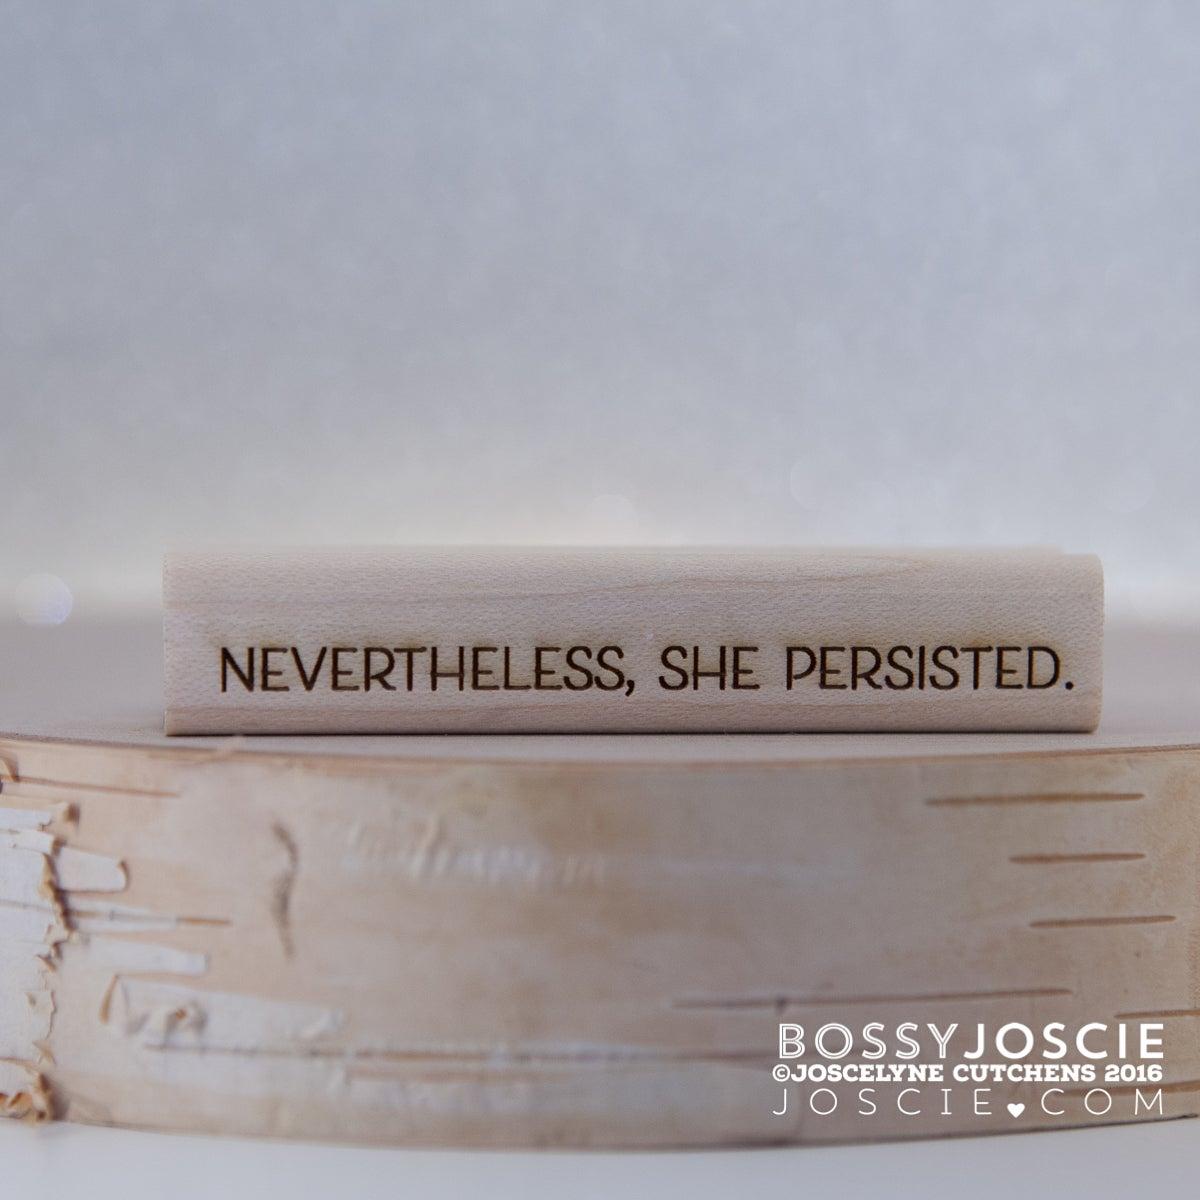 bossy Joscie — nevertheless, she persisted.